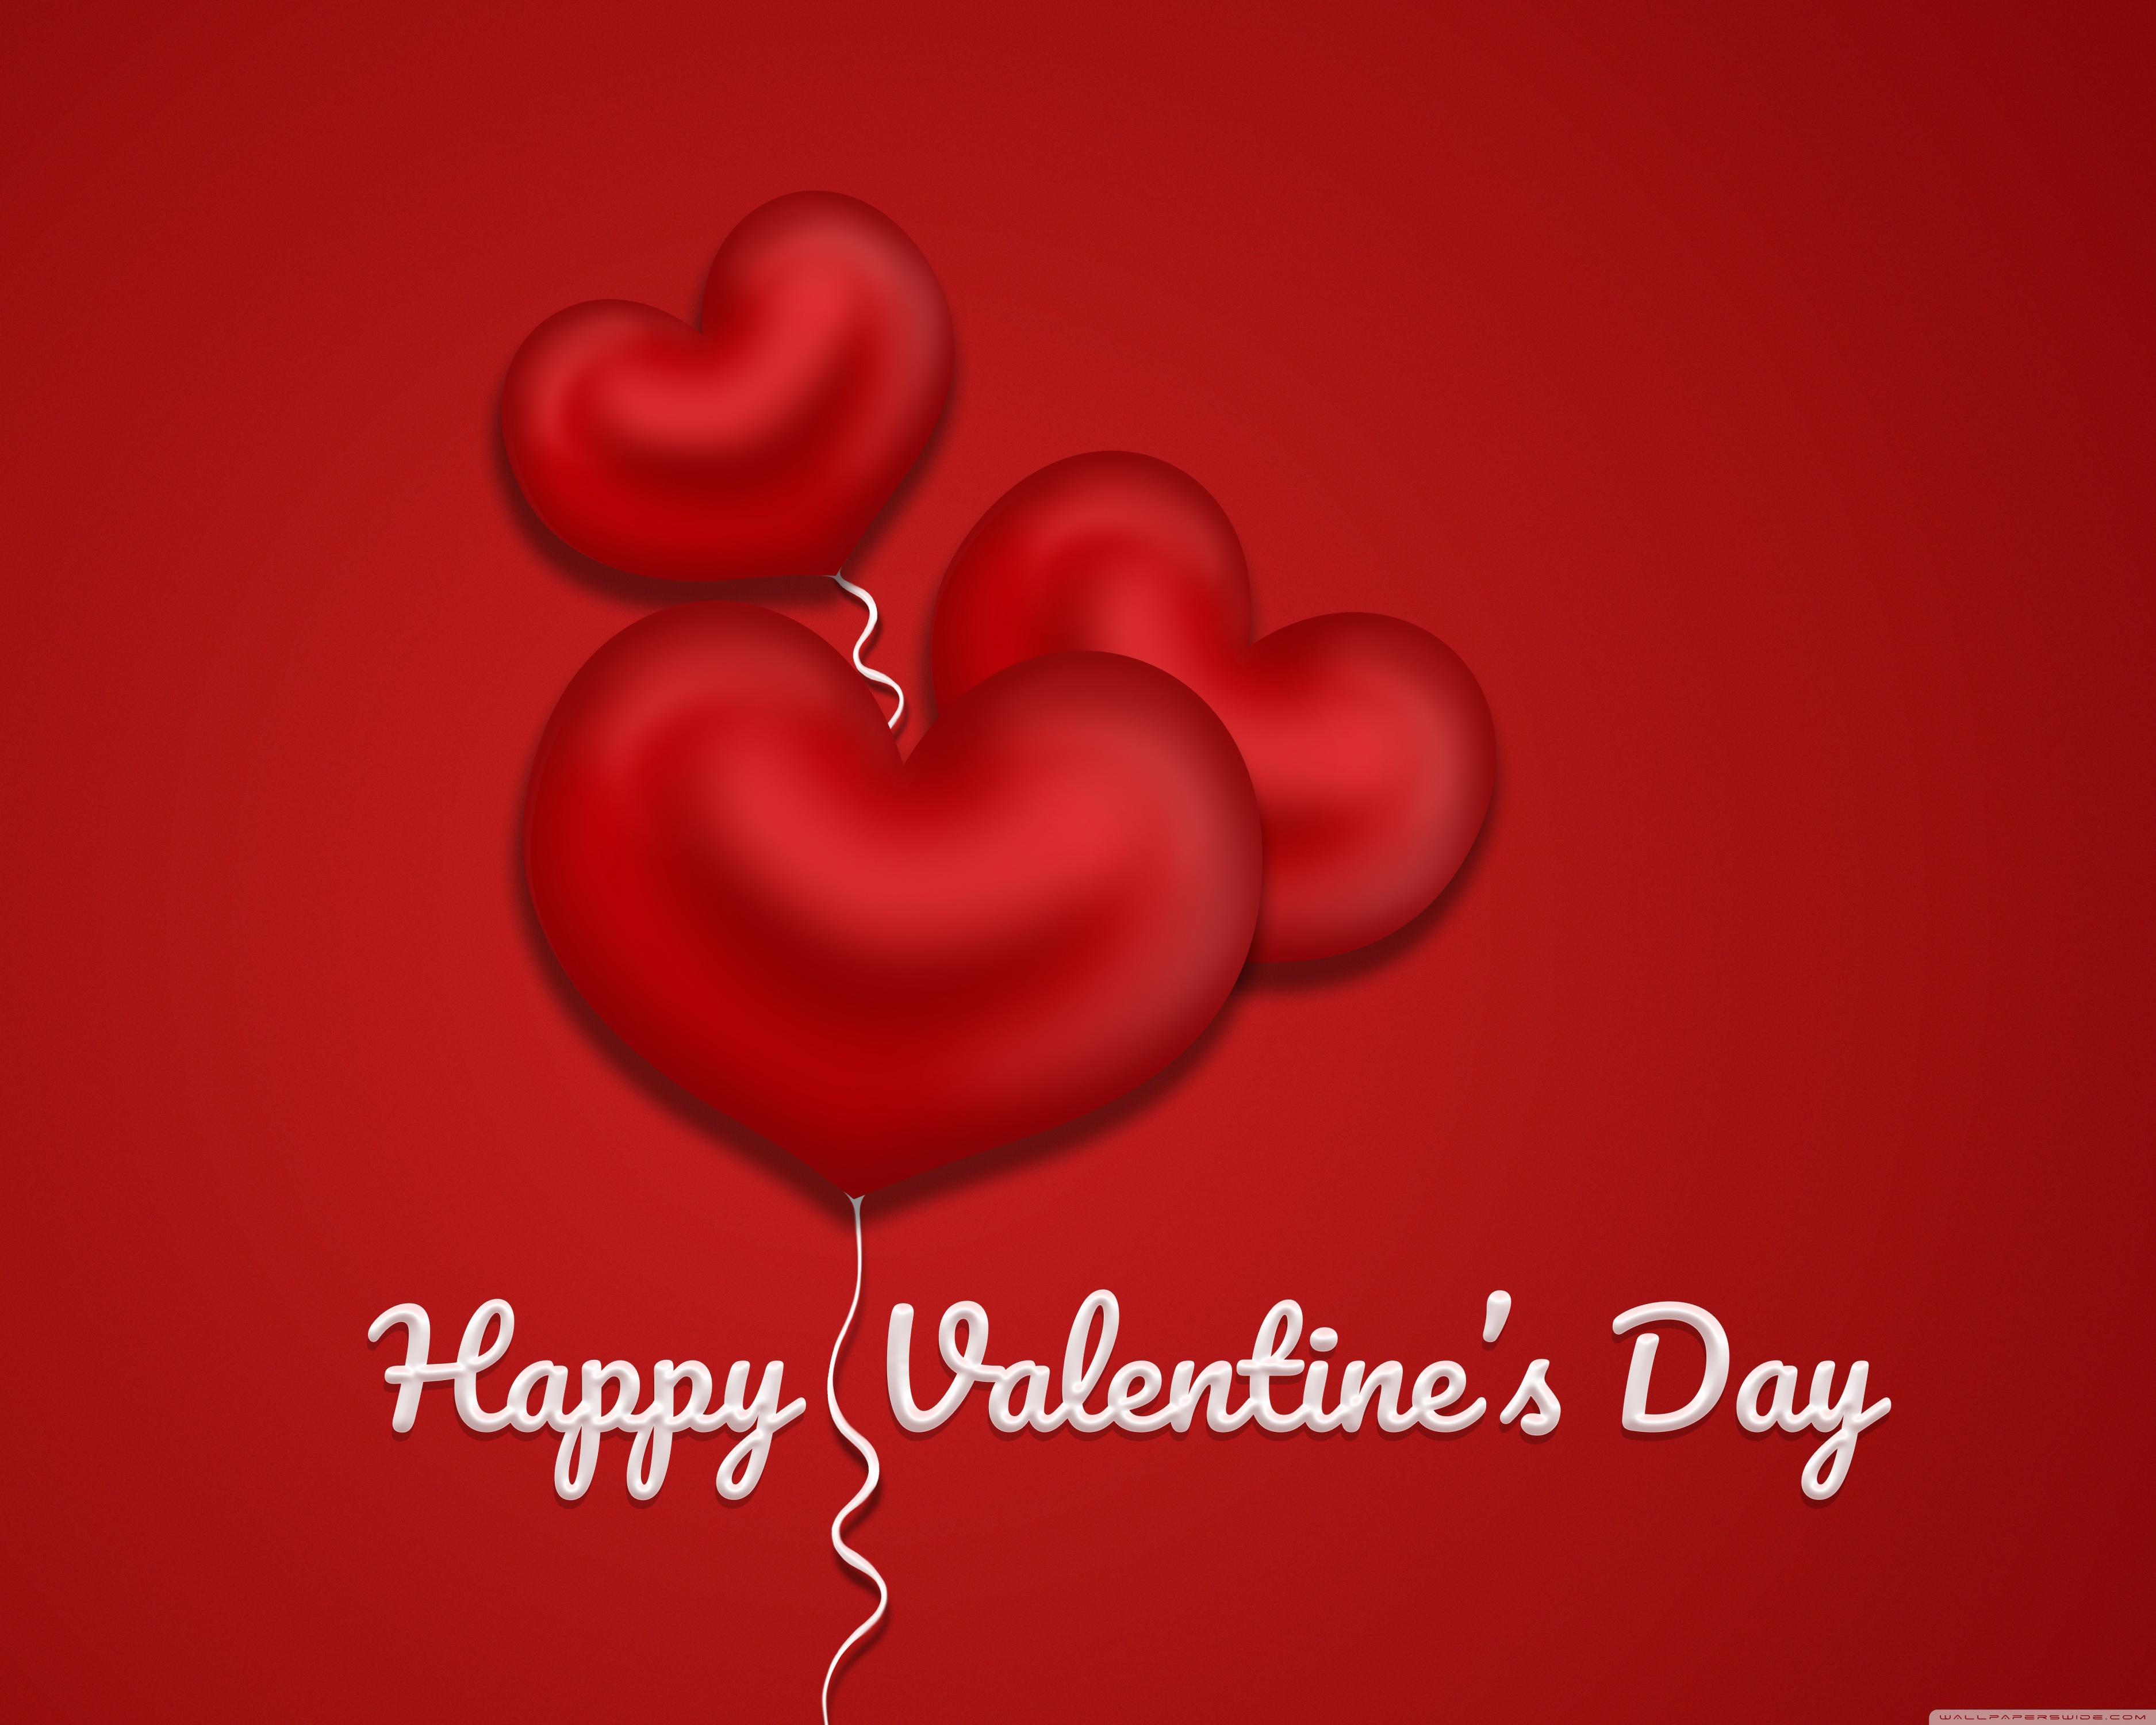 Happy Valentines Day 2020 Ultra HD Desktop Background Wallpaper 3750x3000